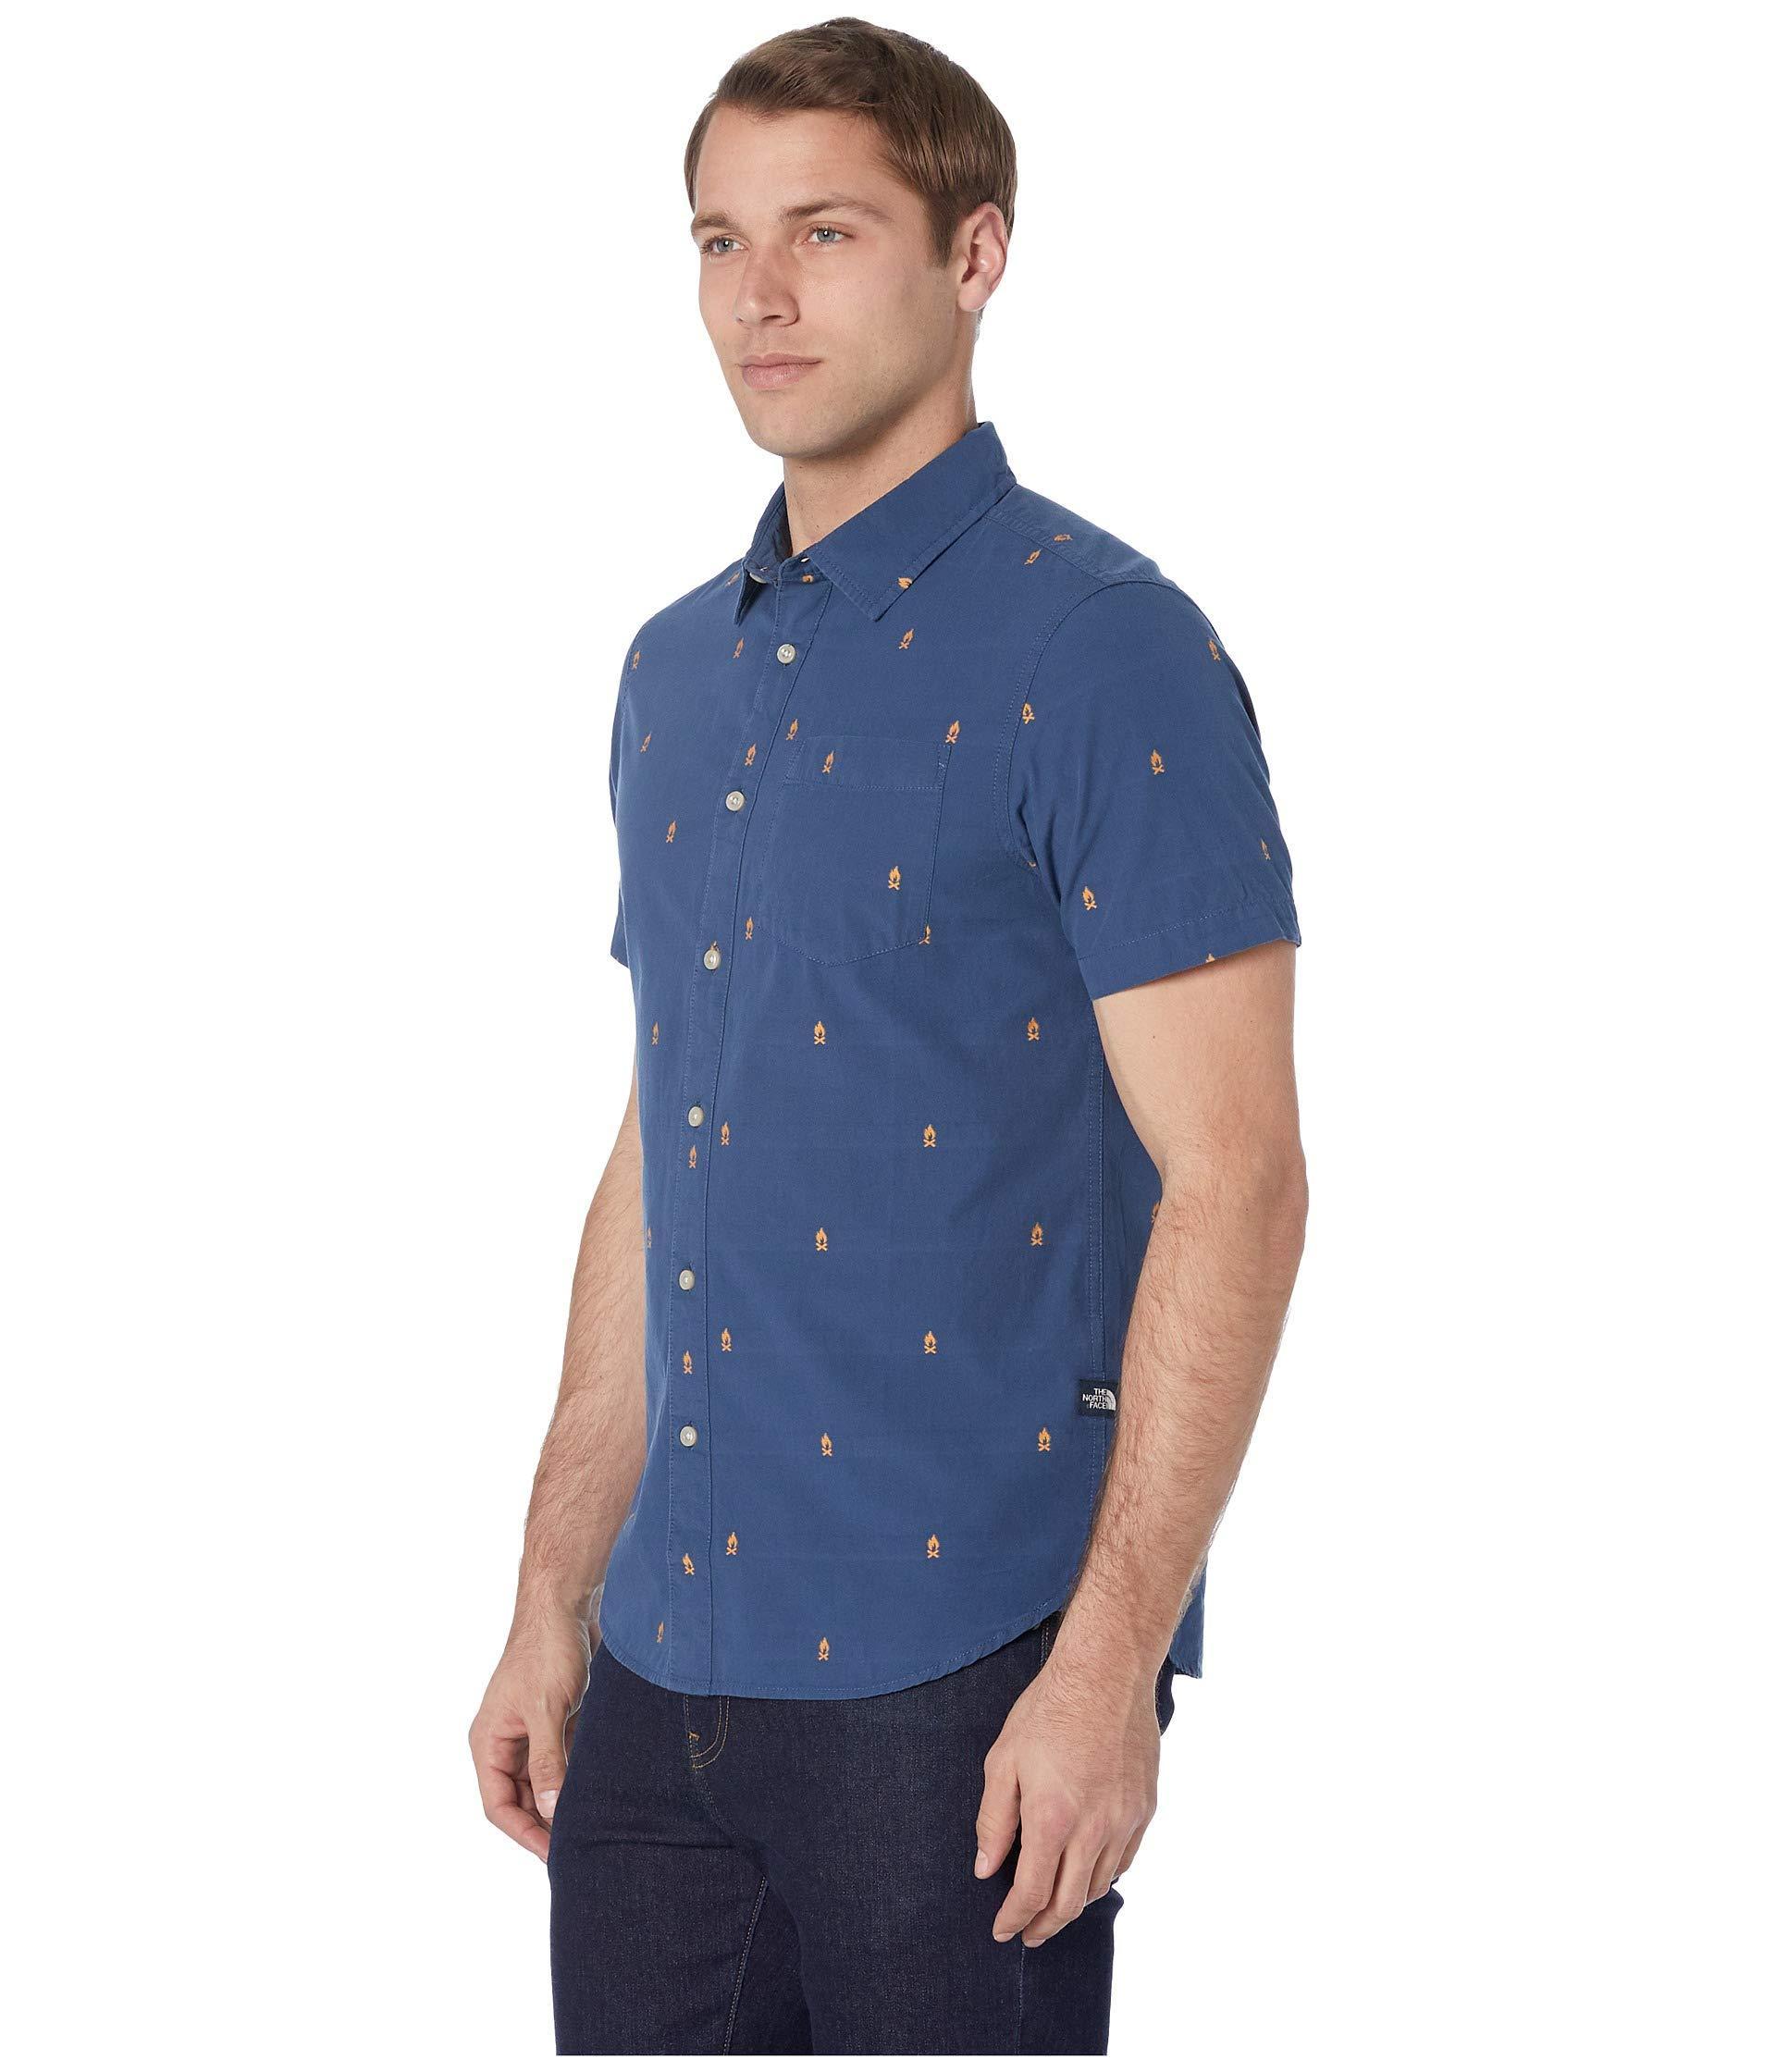 e5de89bd5 Lyst - The North Face Short Sleeve Baytrail Jacquard Shirt (vintage ...